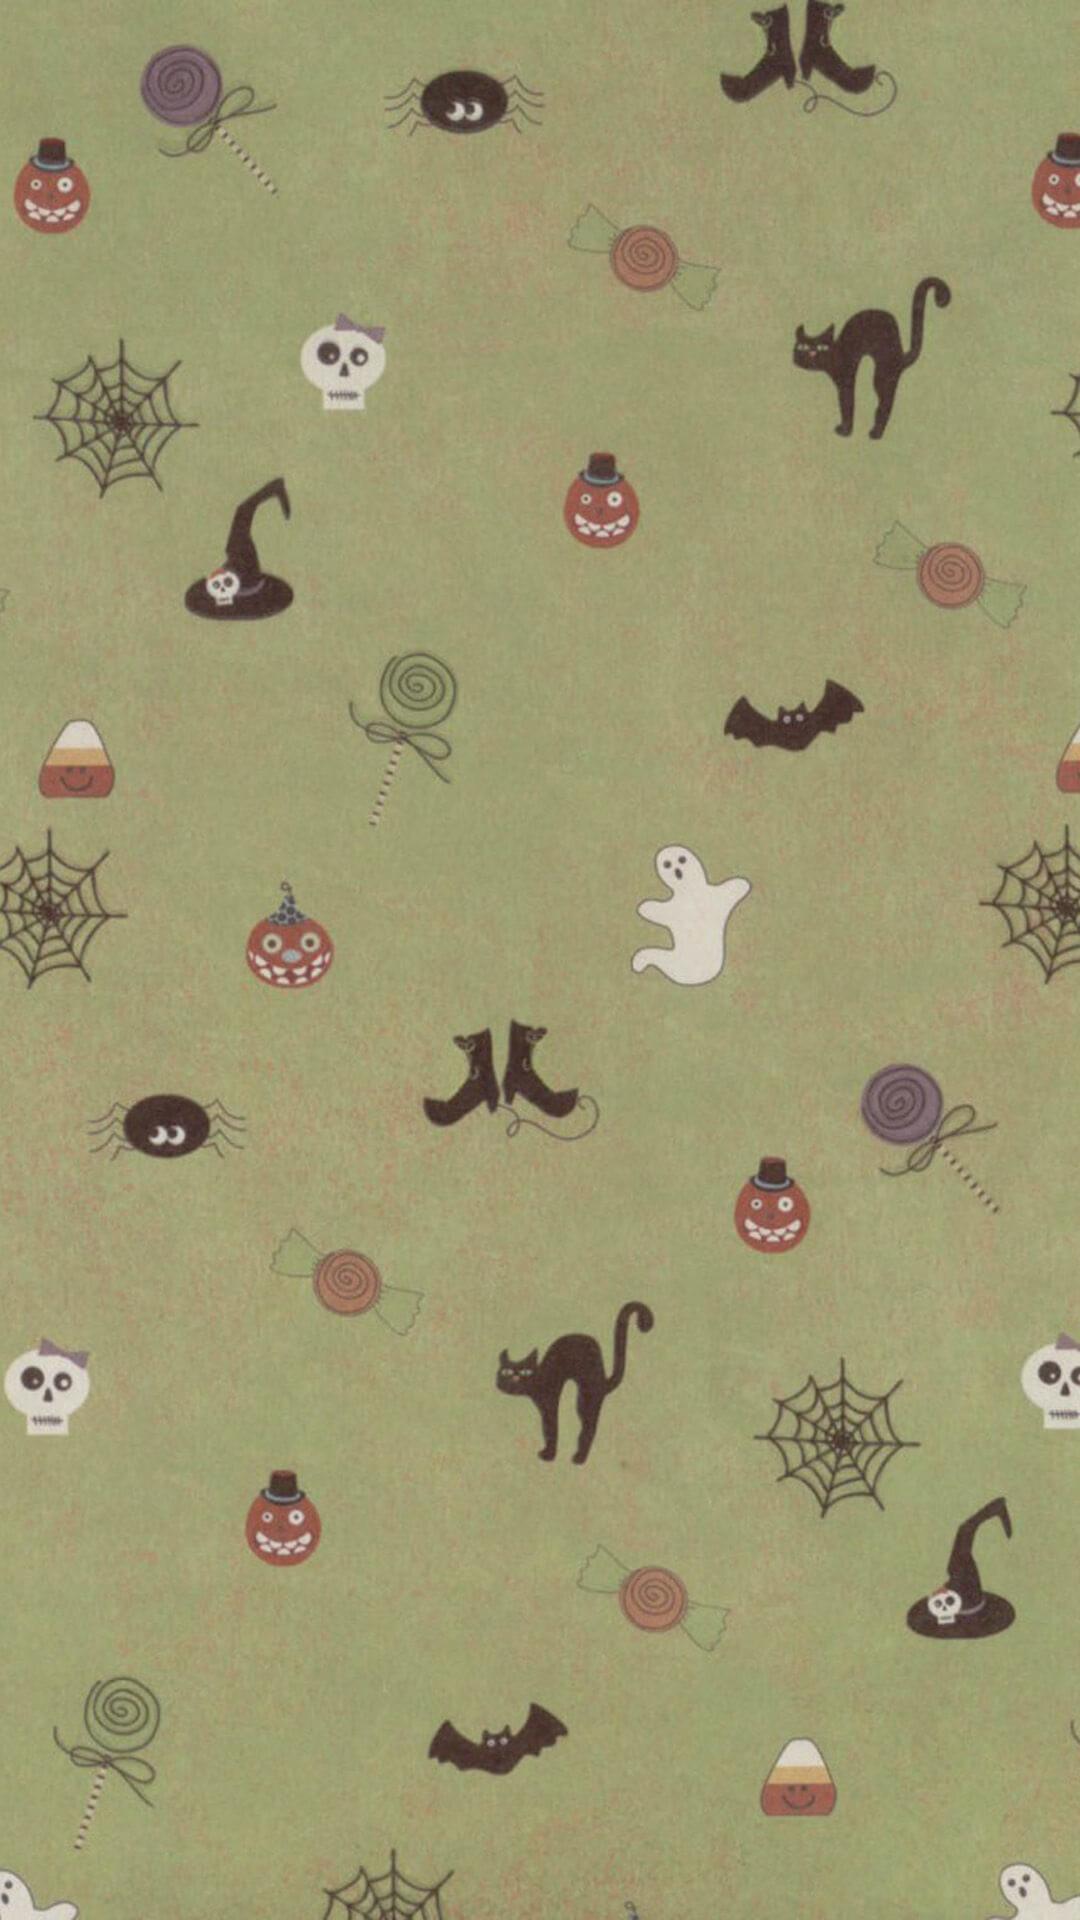 halloween phone wallpaper H | lyybj